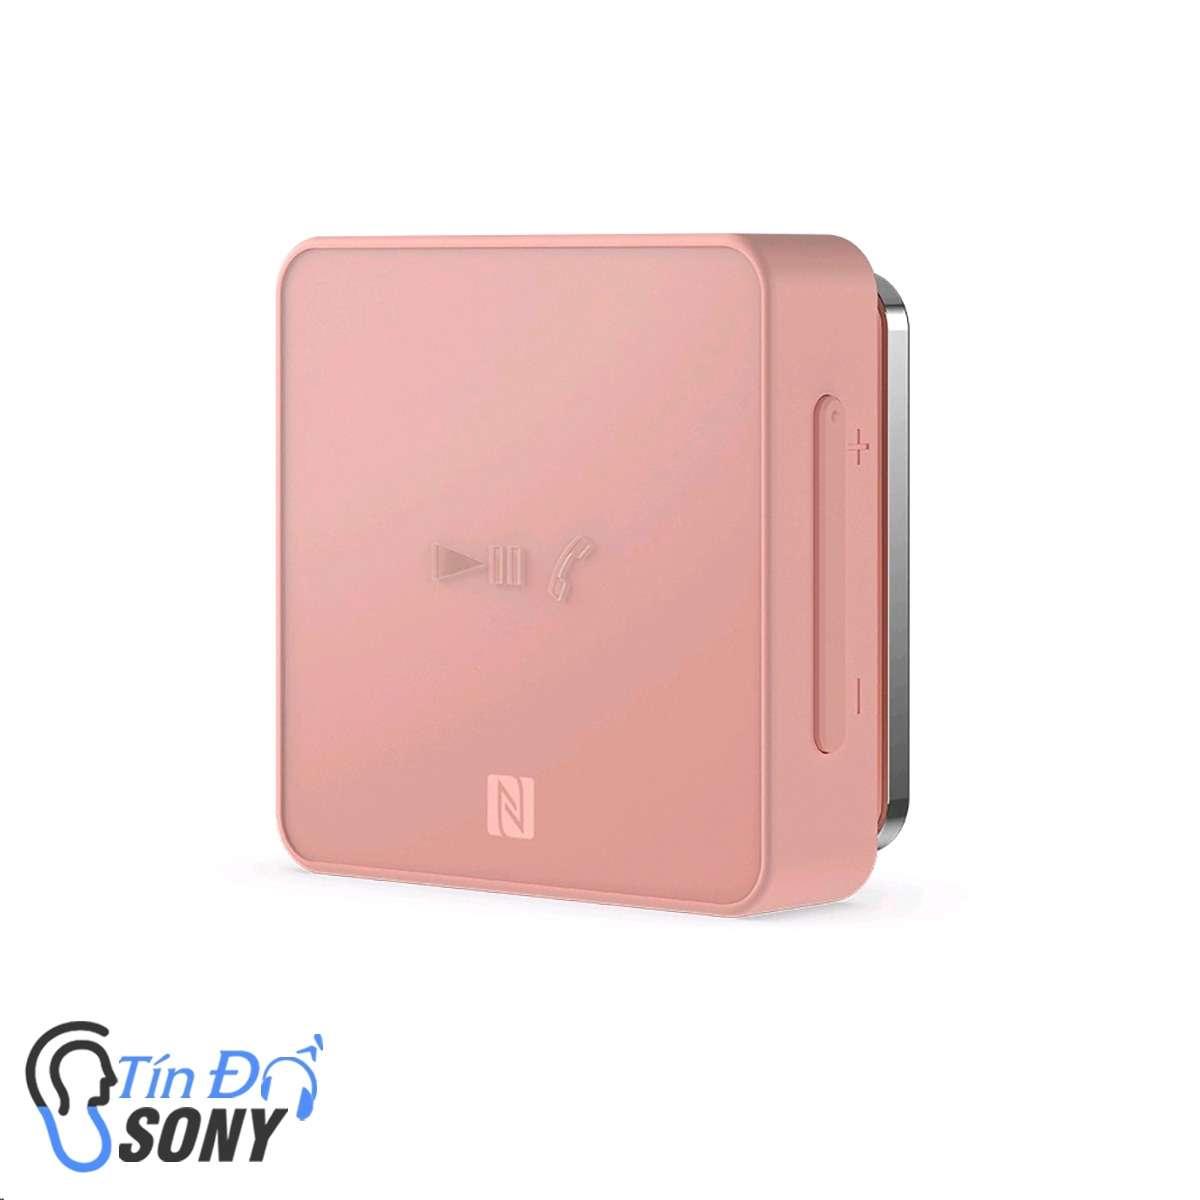 Tai nghe bluetooth Sony SBH24 (New)